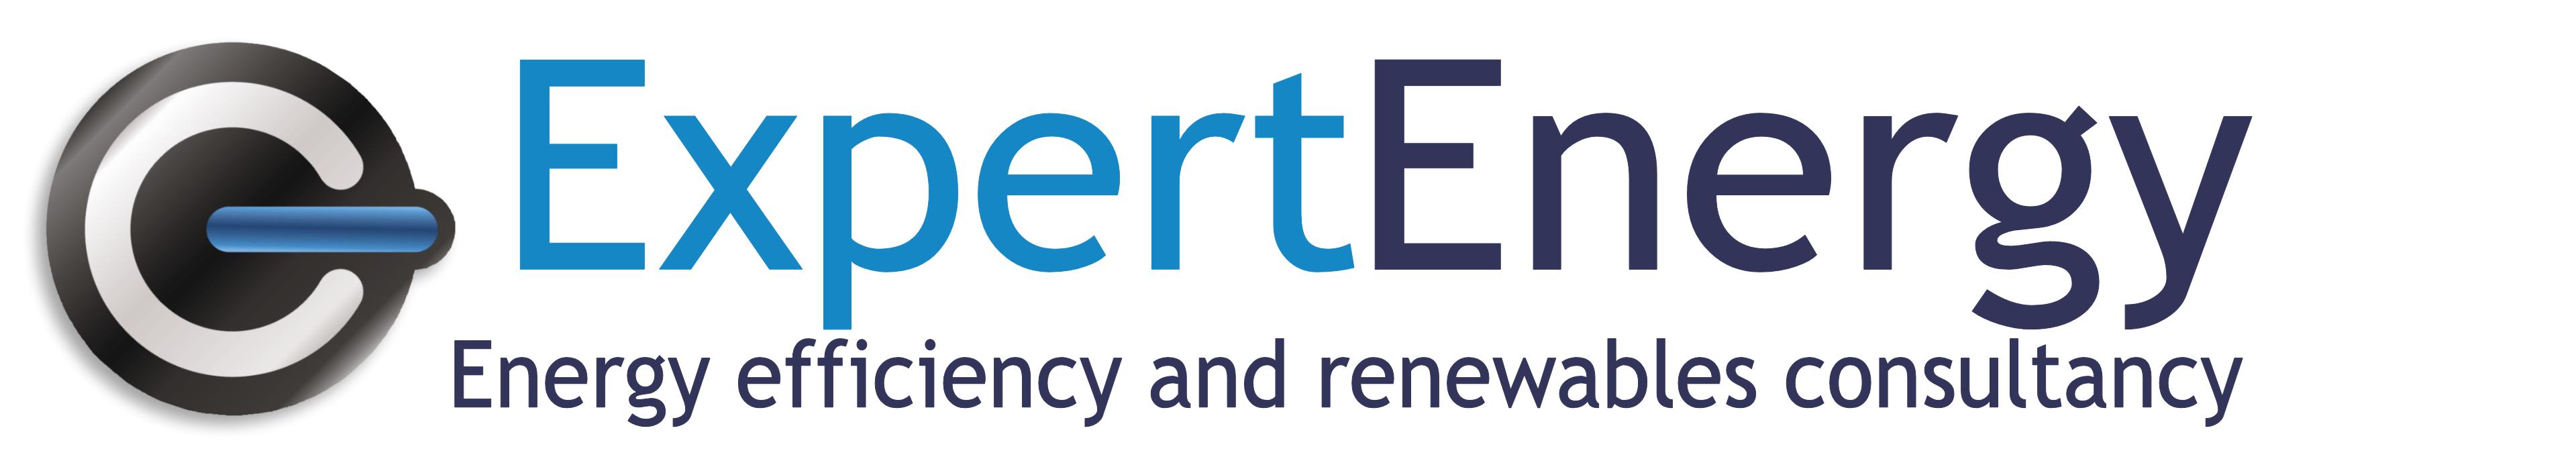 Expert Energy